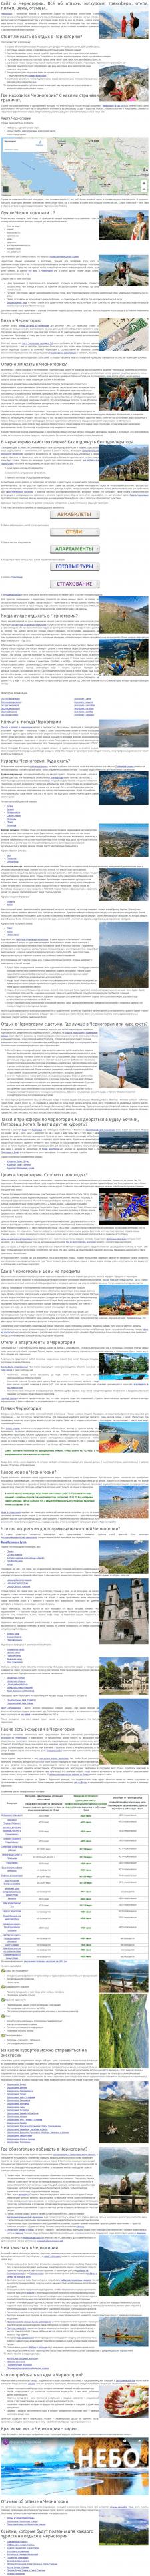 ТУРИЗМ | Все о Черногории